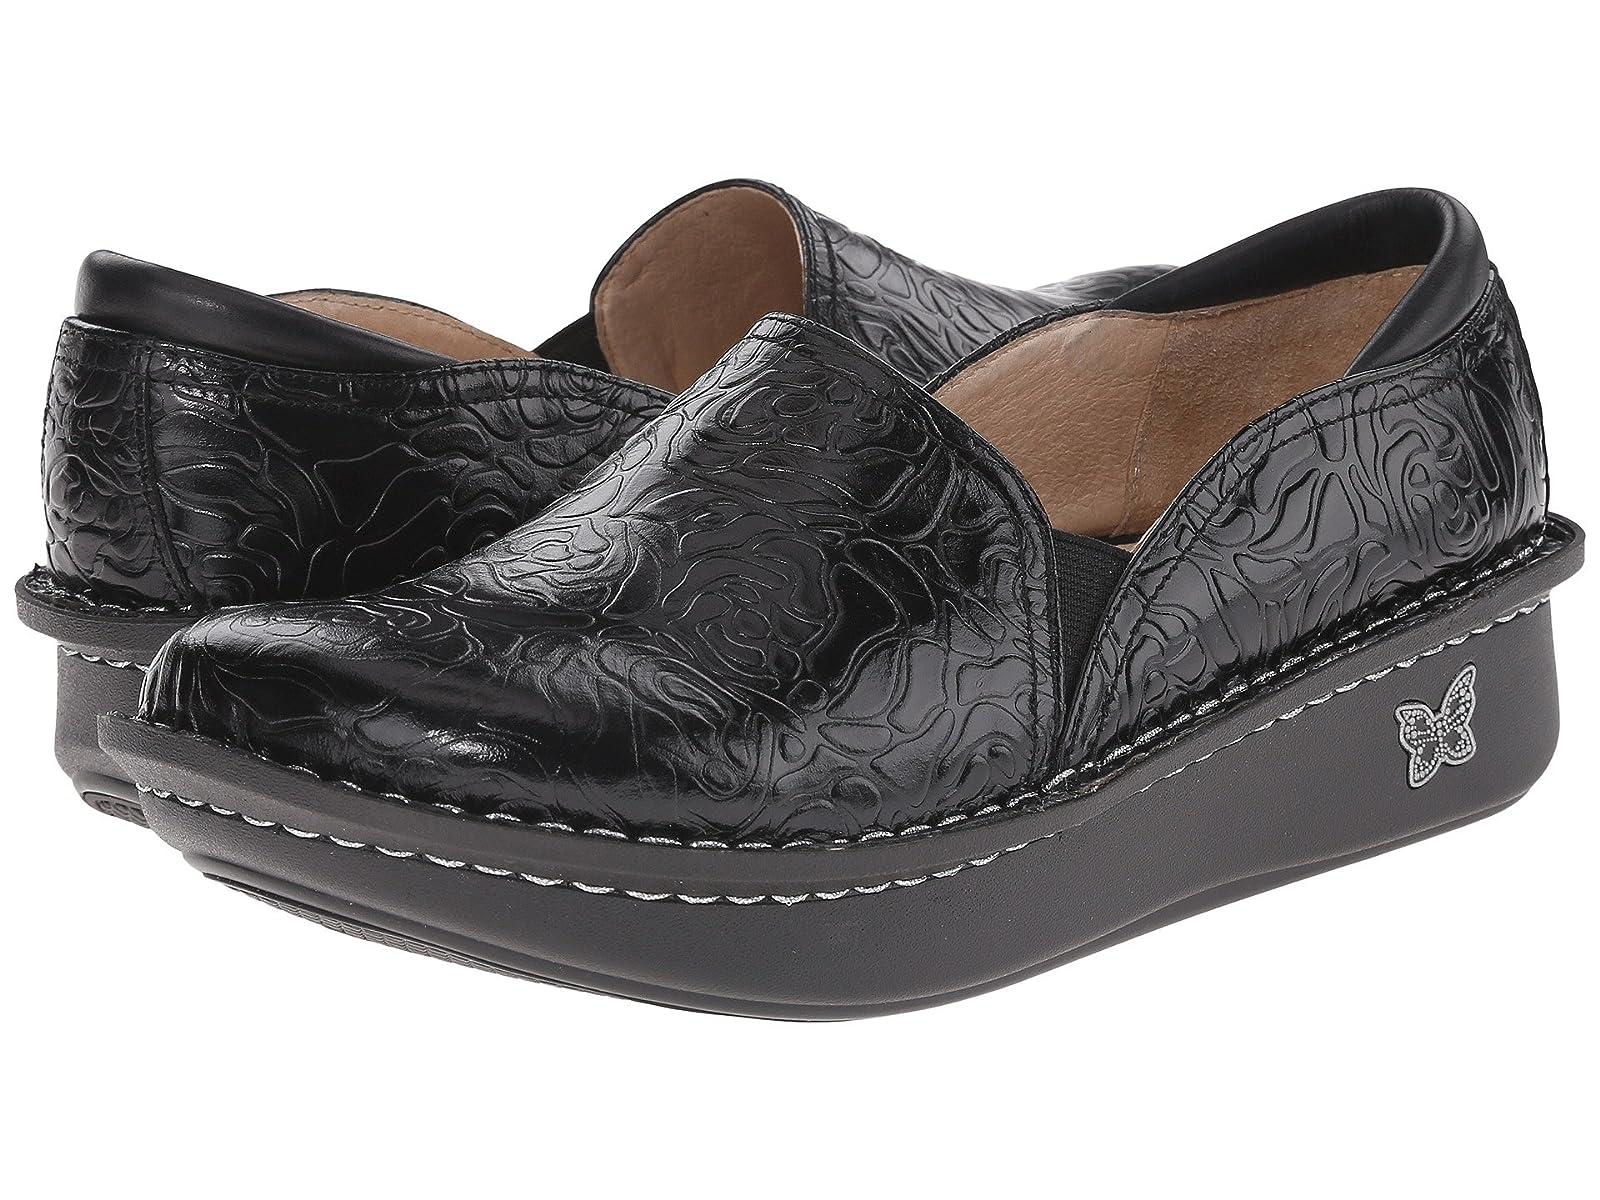 Alegria Debra ProfessionalEconomical and quality shoes